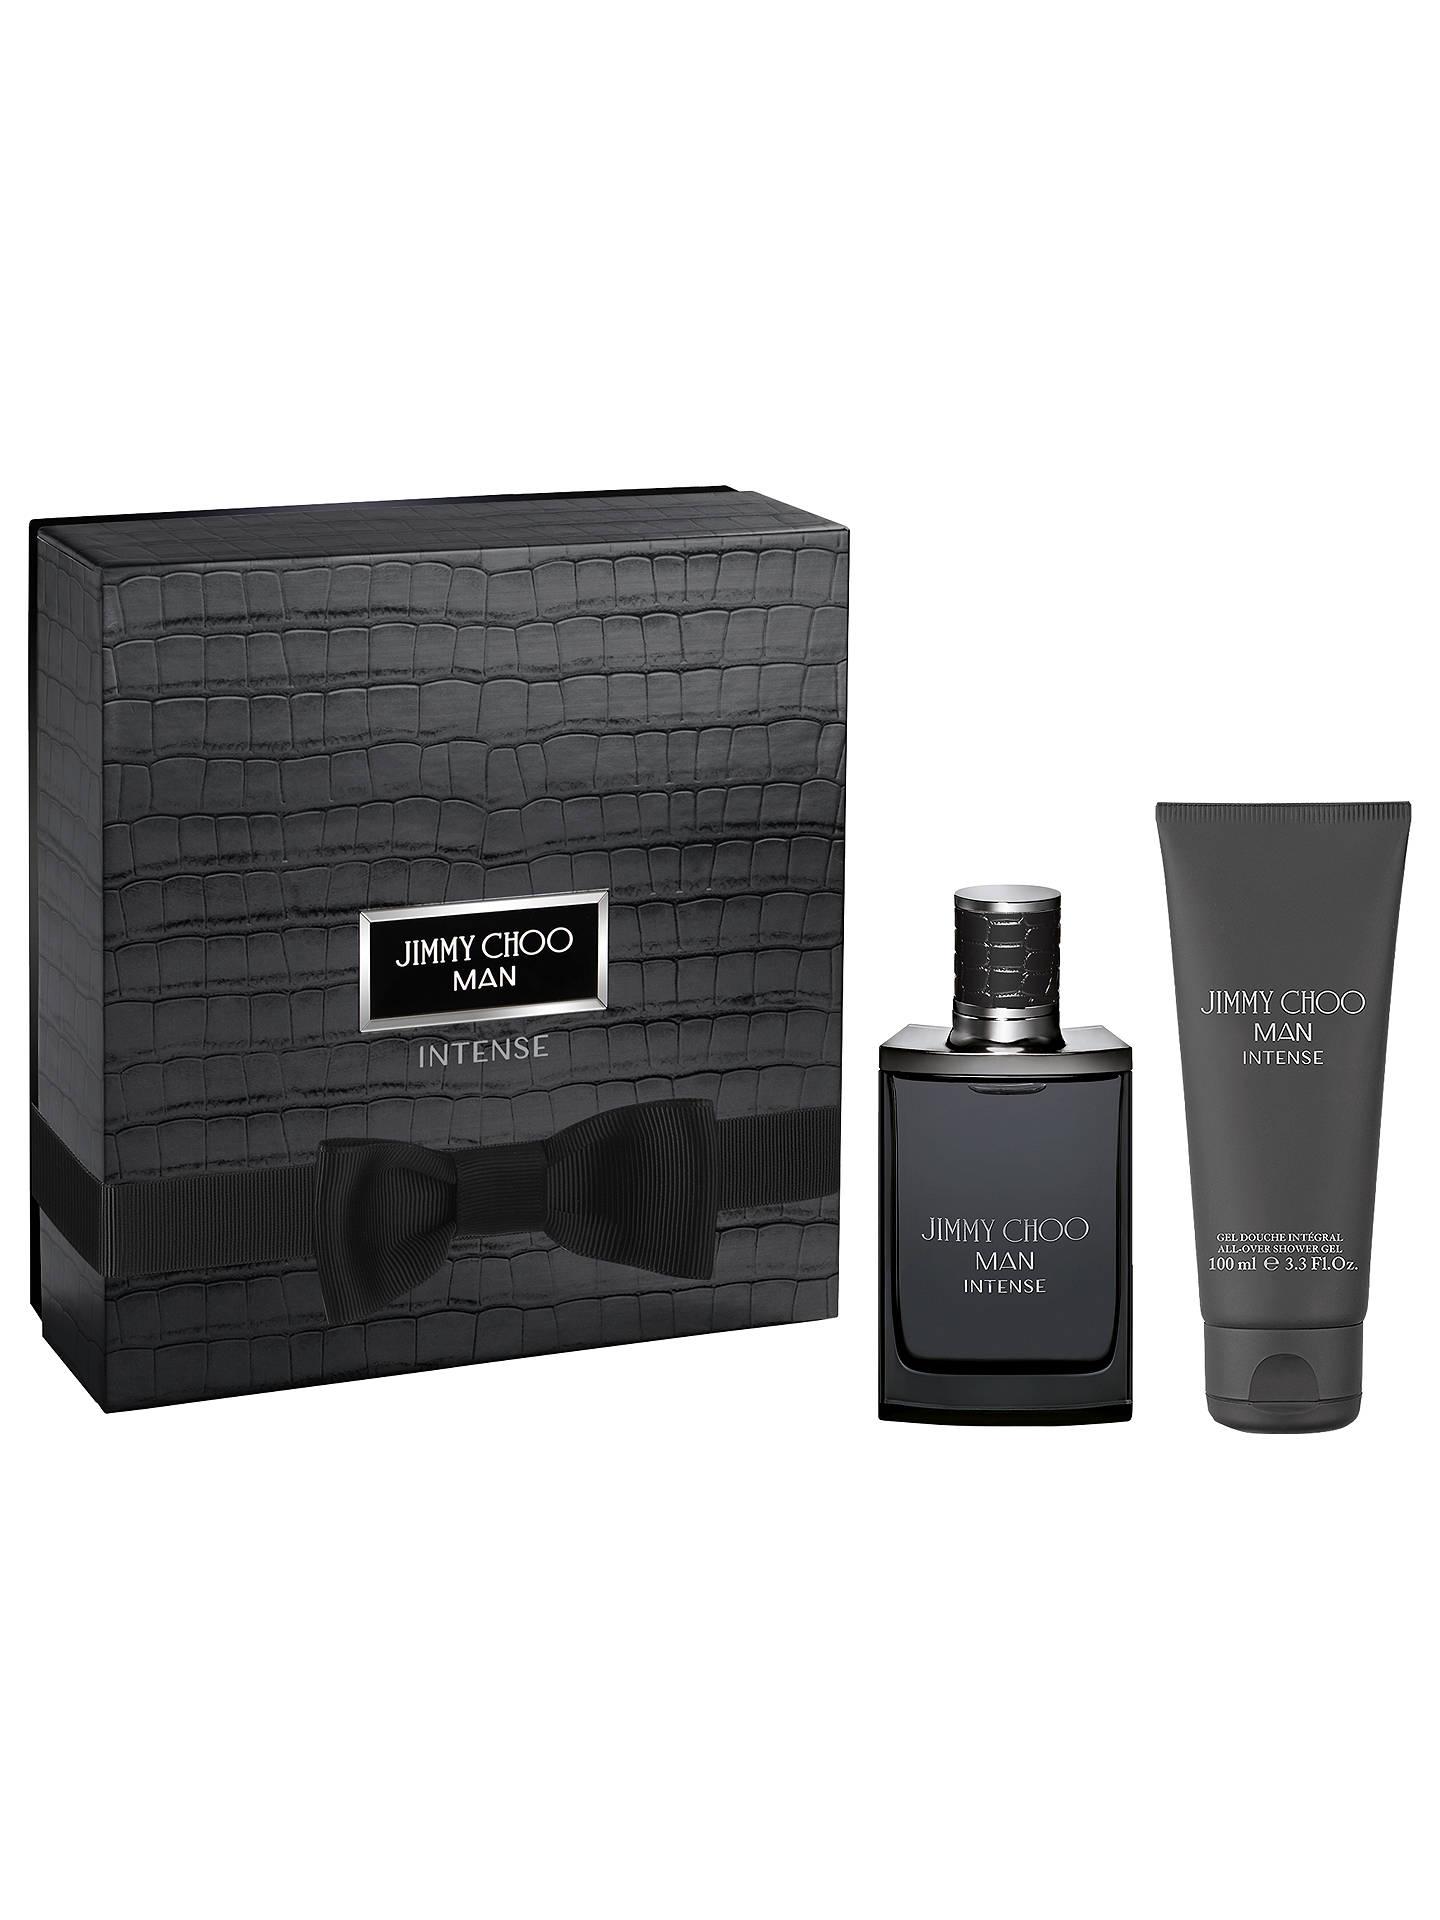 BuyJimmy Choo Man Intense 50ml Eau de Toilette Fragrance Gift Set Online at  johnlewis.com 61d4c15c1